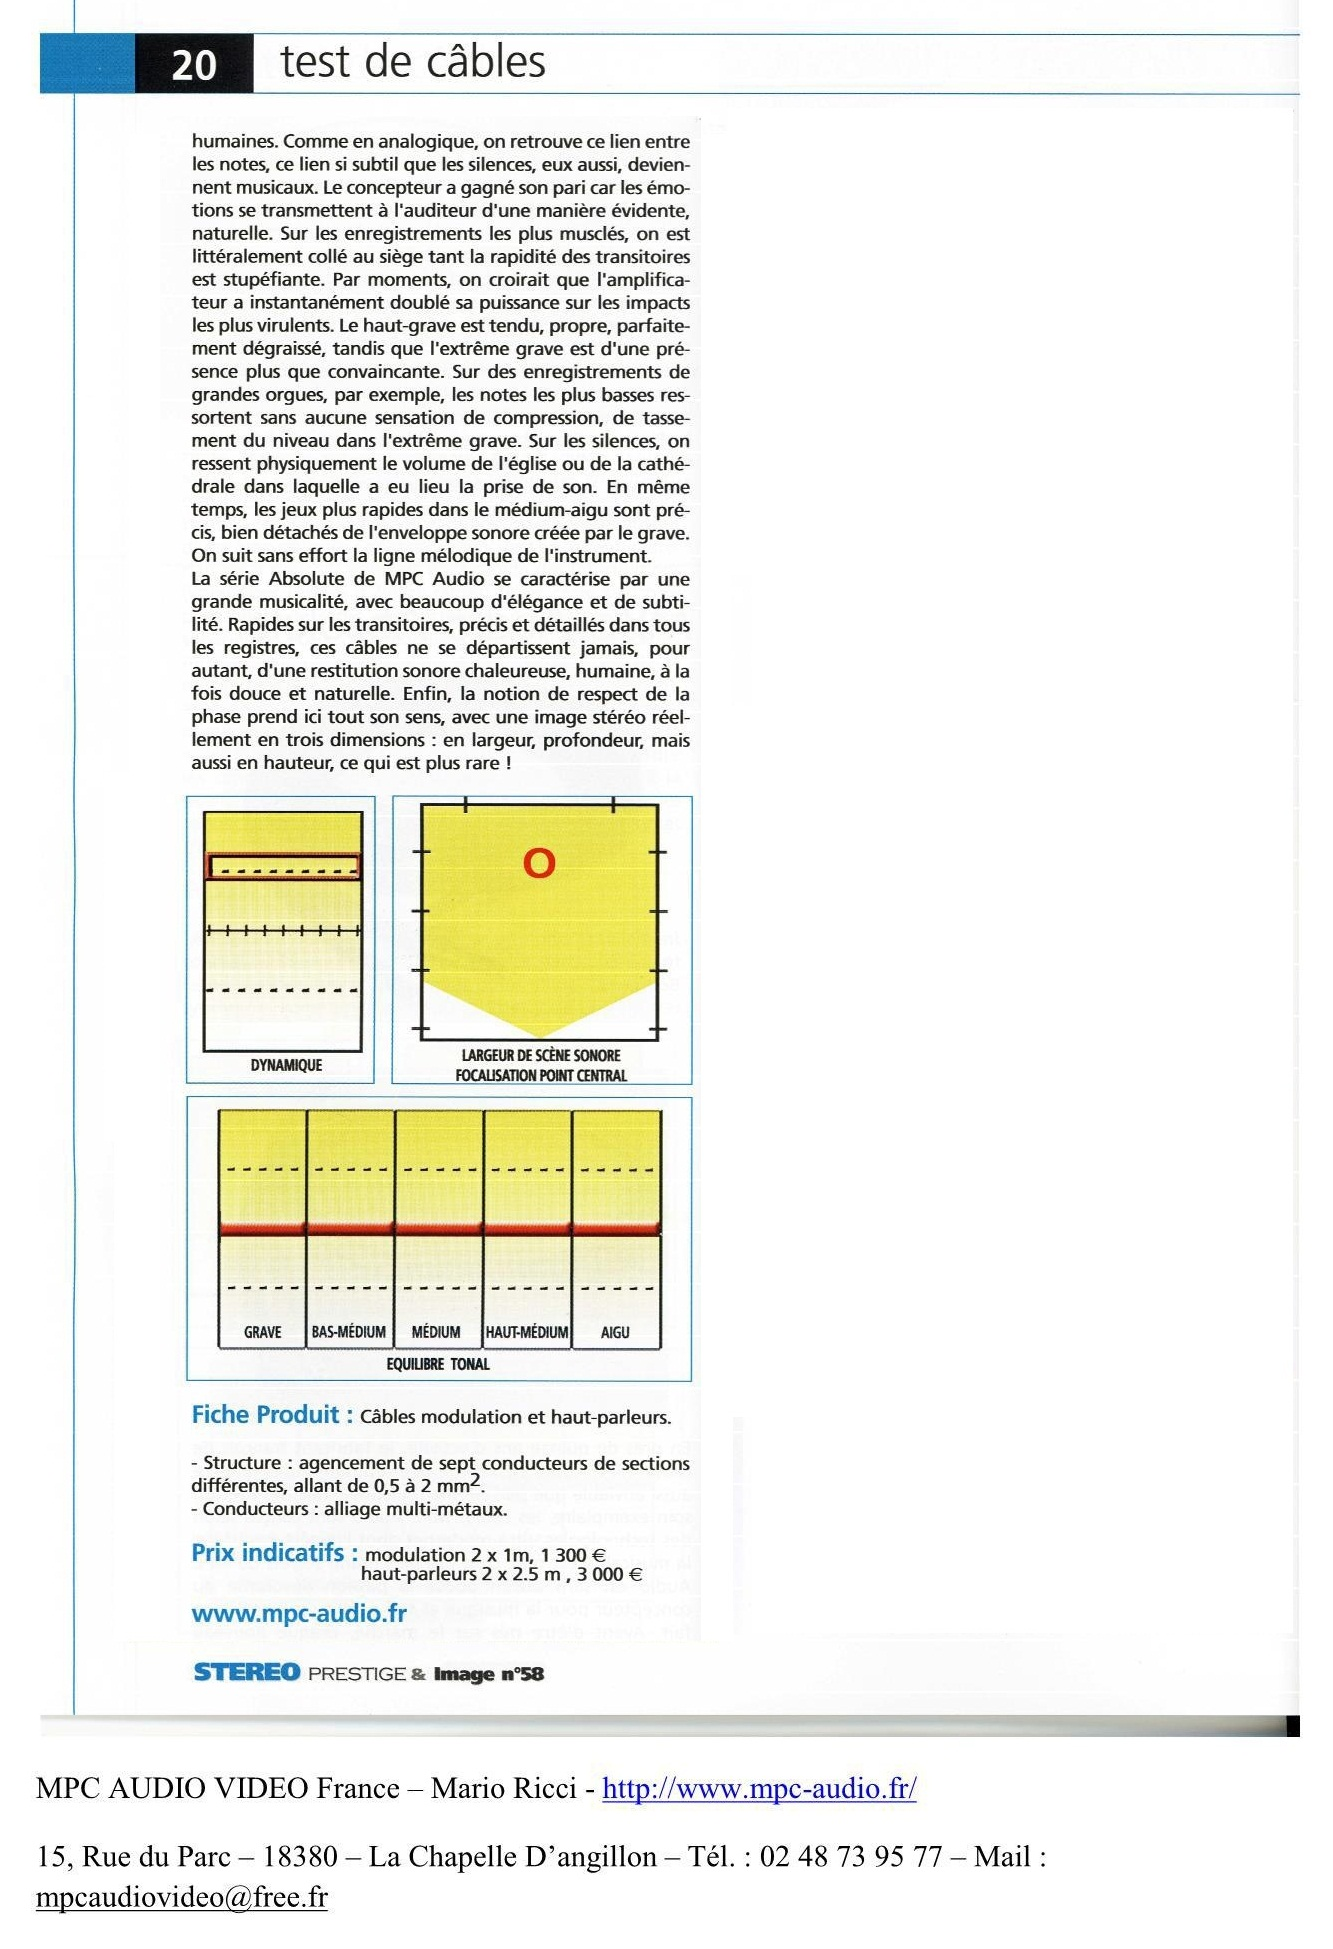 2011 - Test Absolute HP et Modulation Stereo Prestige Juillet Aout 2011 2 sur 2